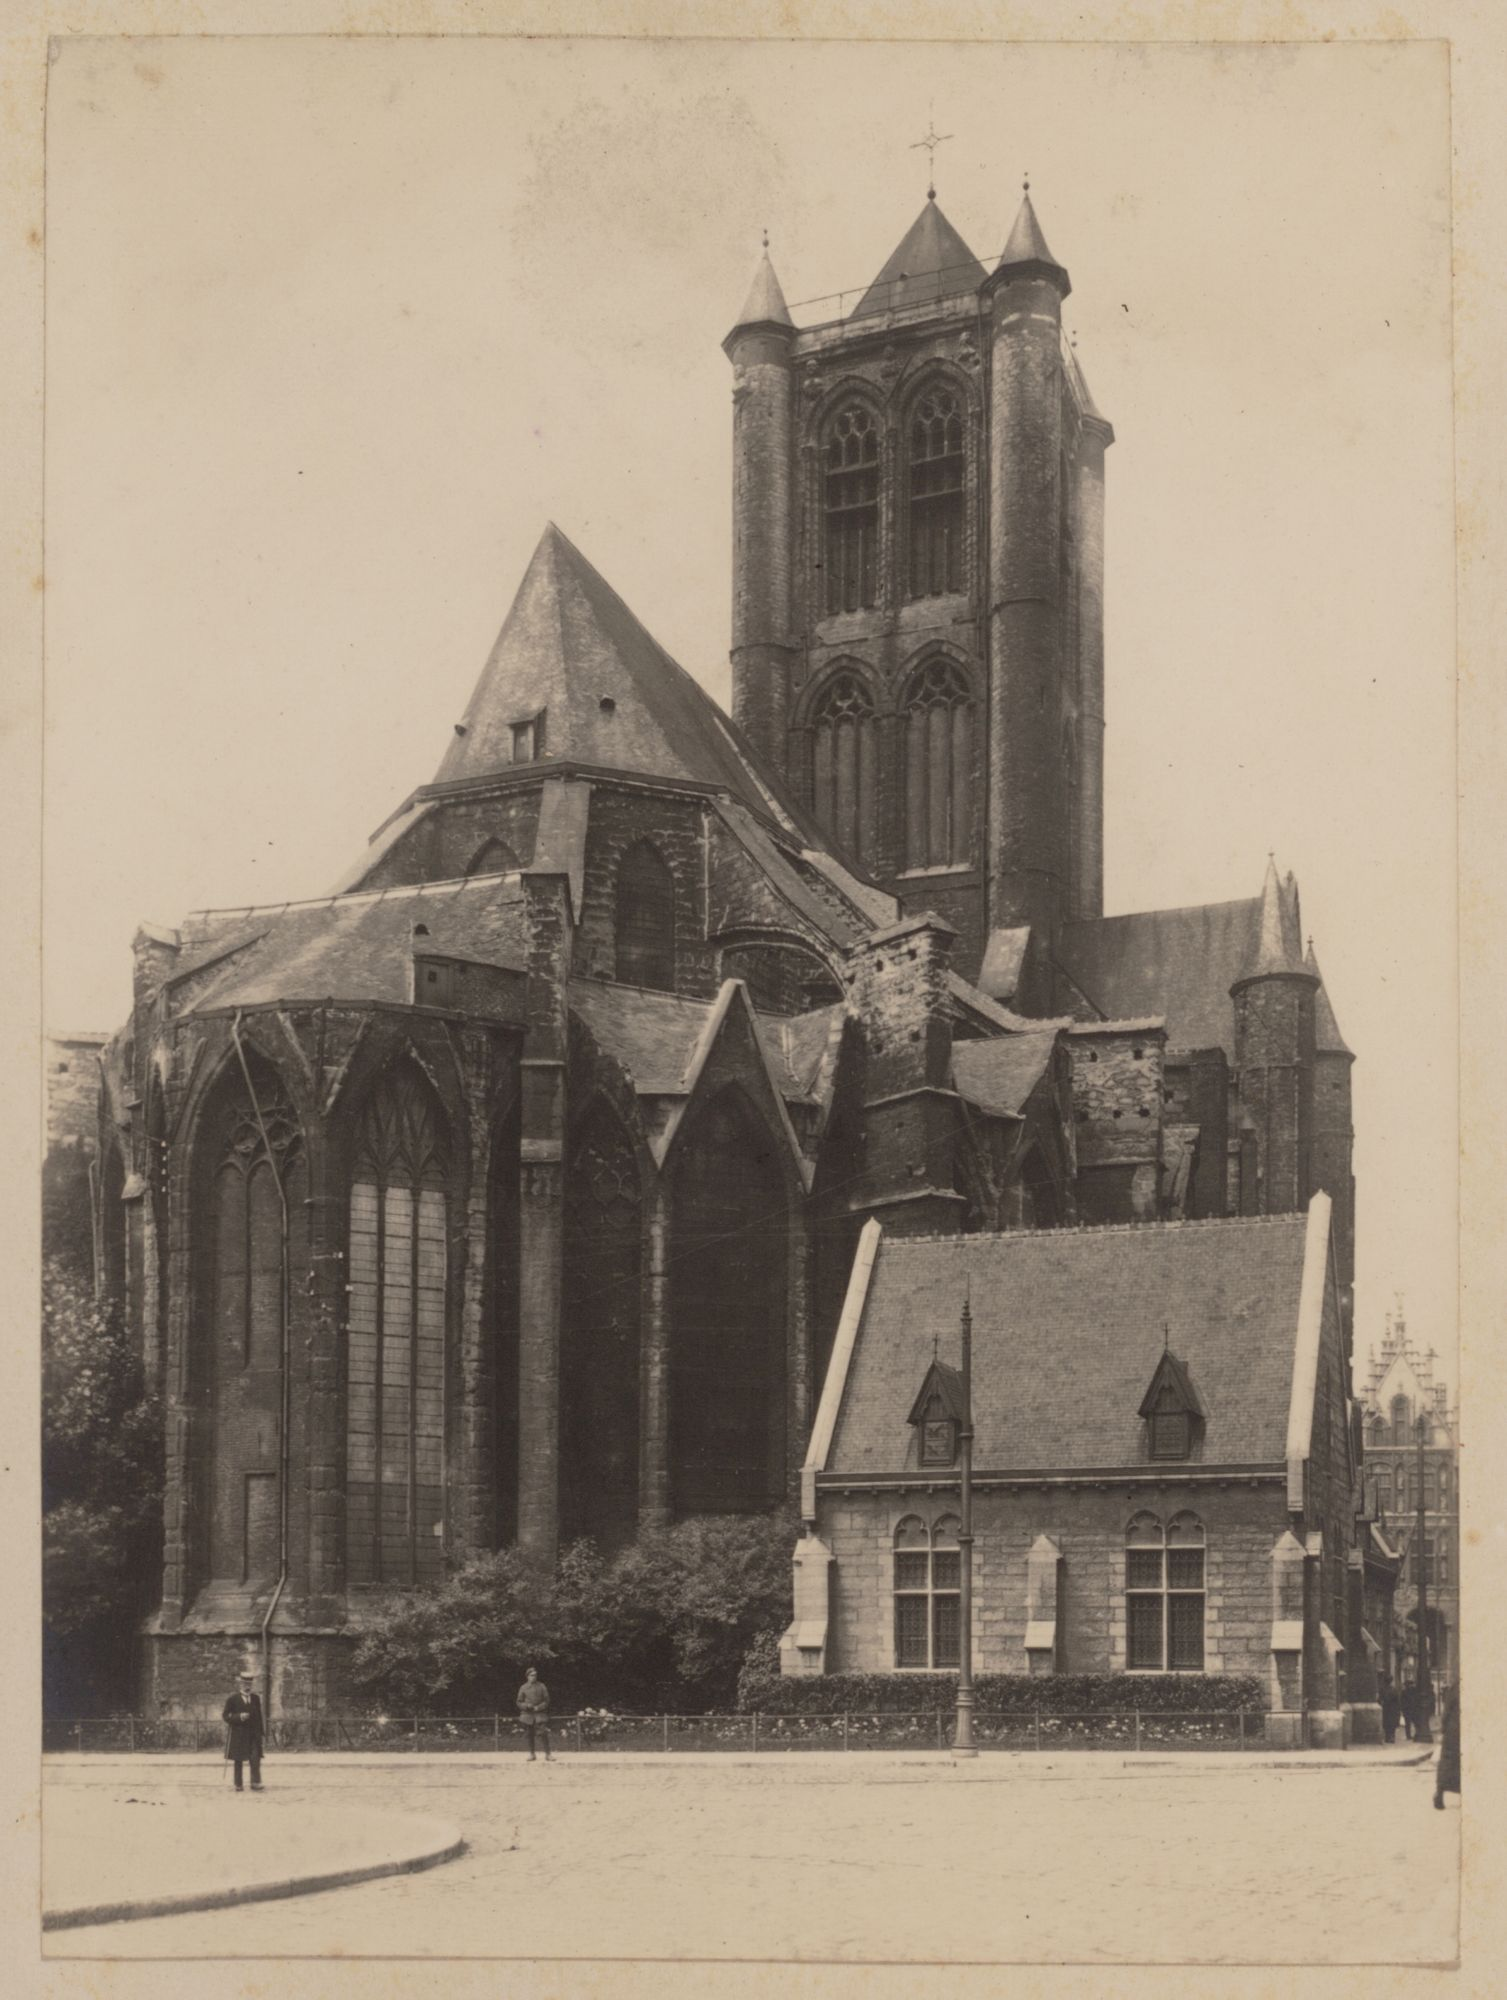 Gent: Sint-Niklaaskerk en sacristie